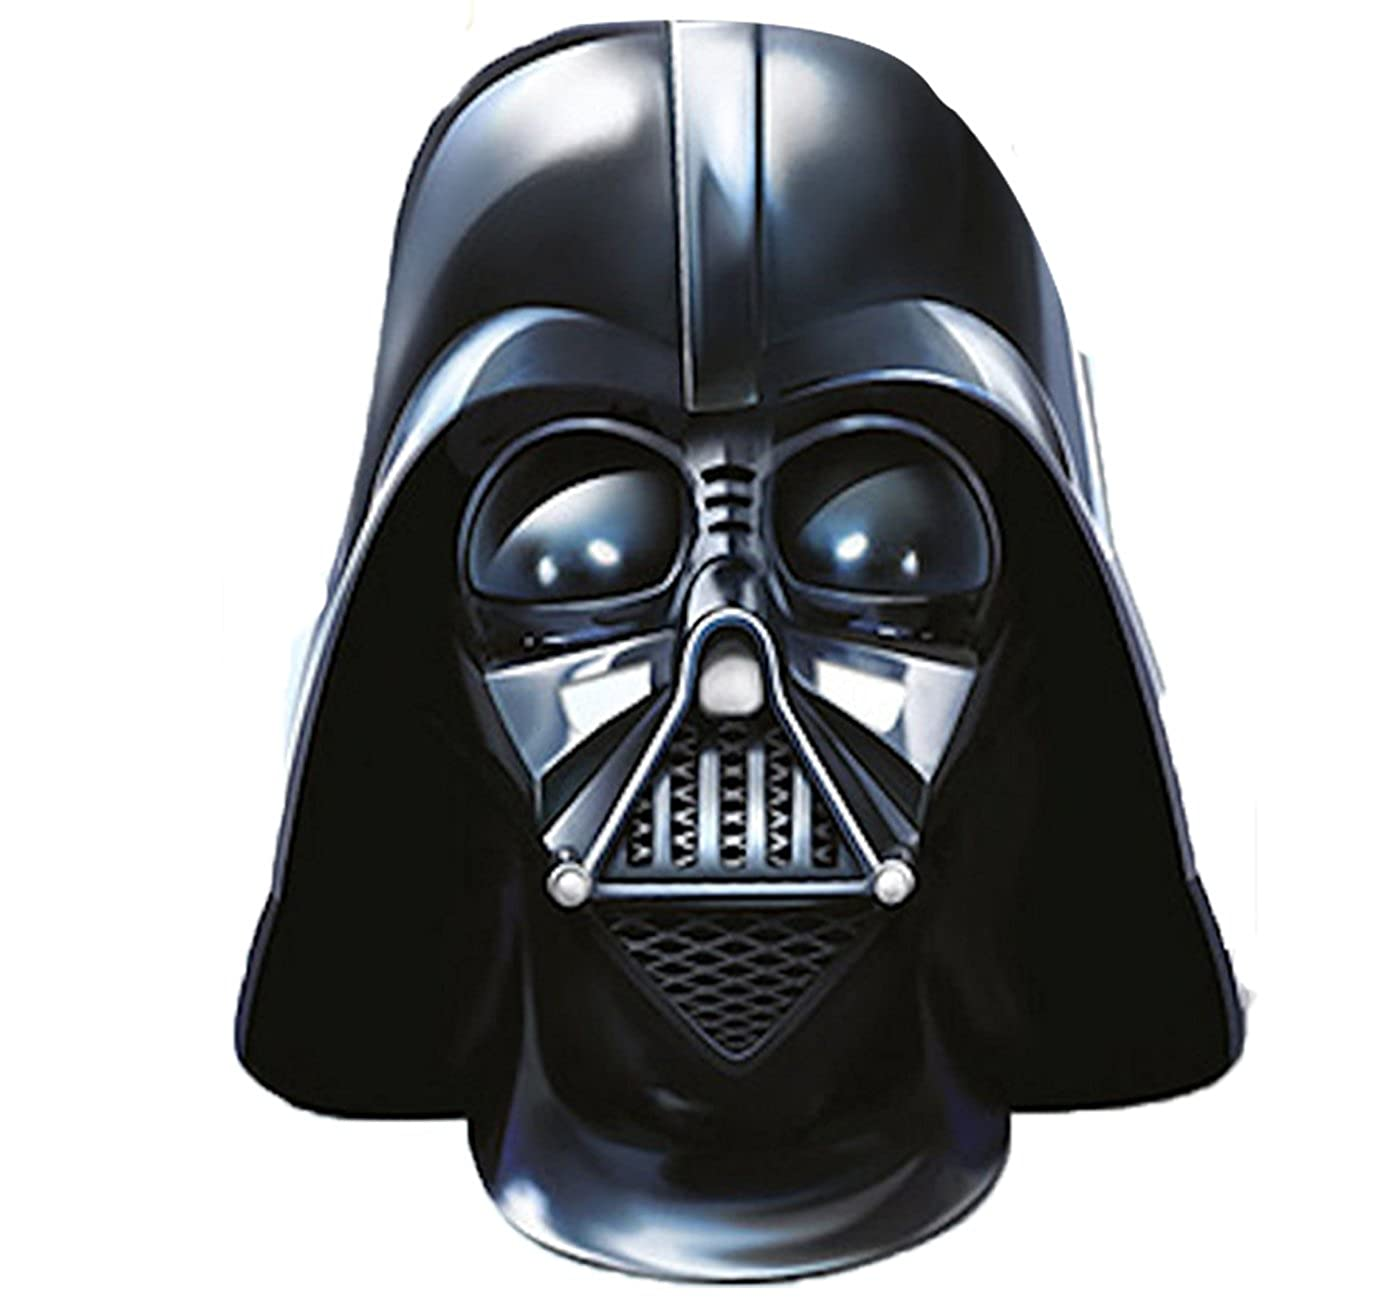 Vader Mask Star Wars Characters Yoda Kylo Ren Storm Fancy Dress Card Disney Film